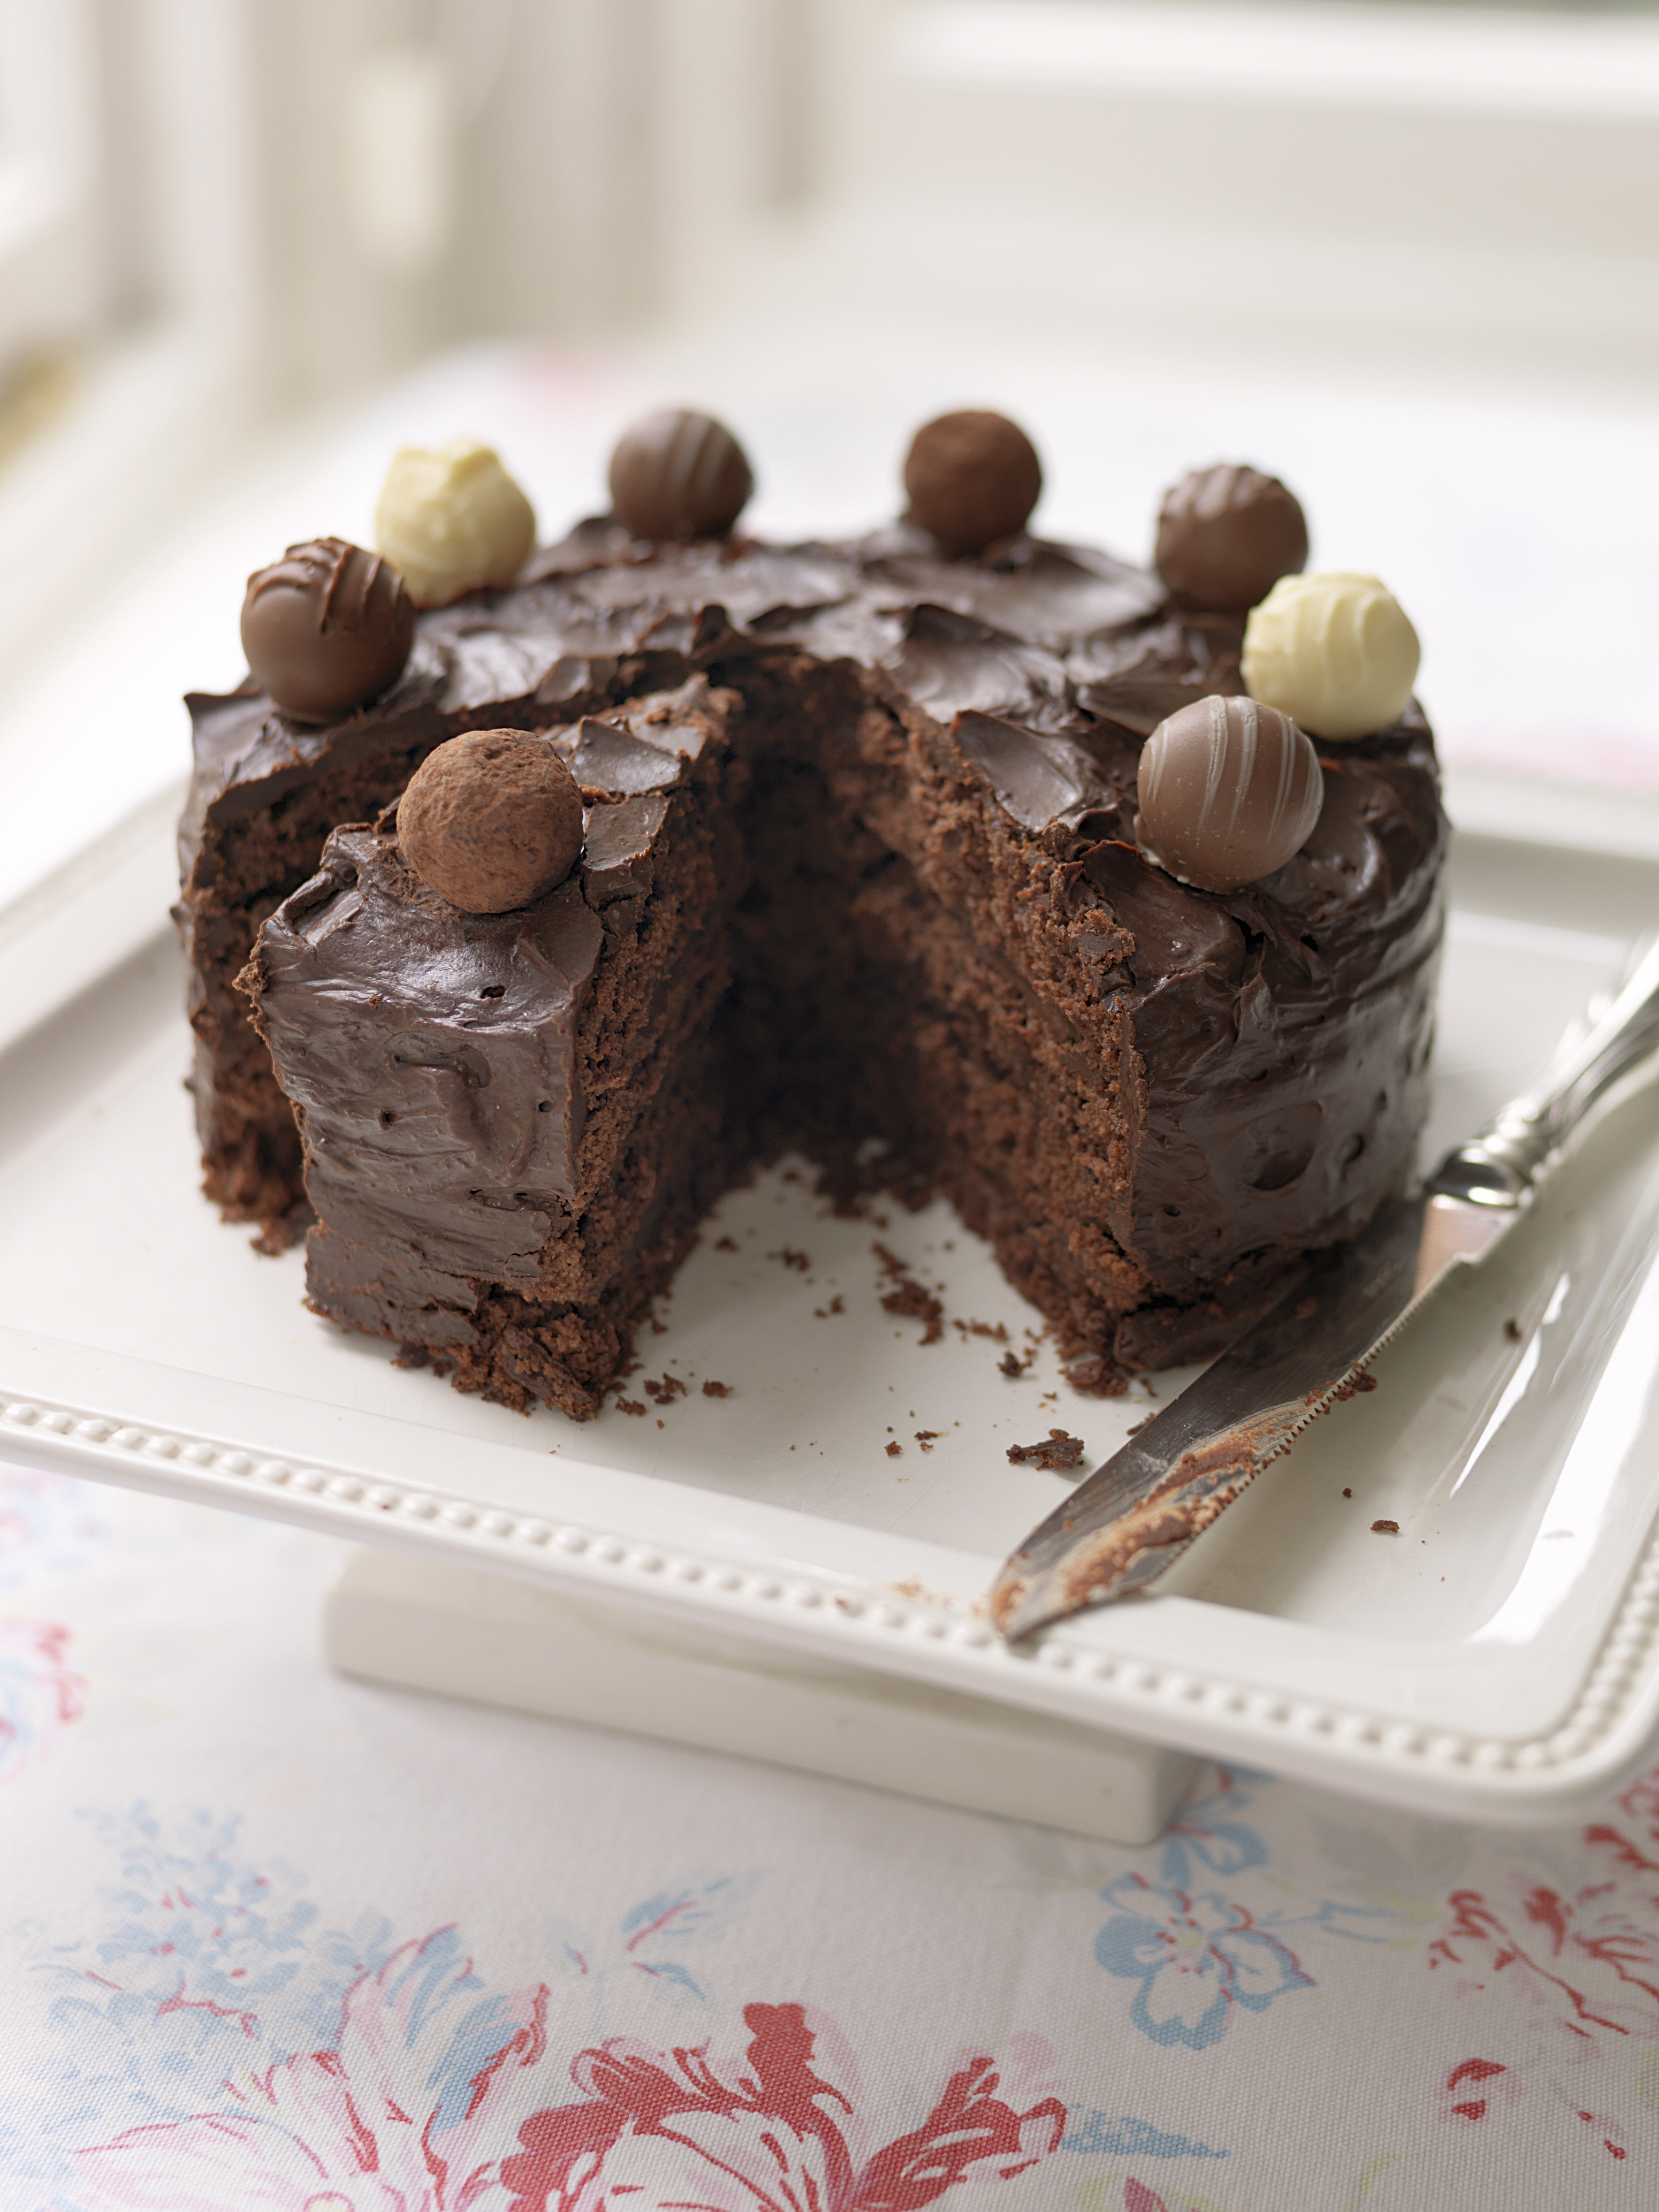 Superb Layered Chocolate Truffle Cake